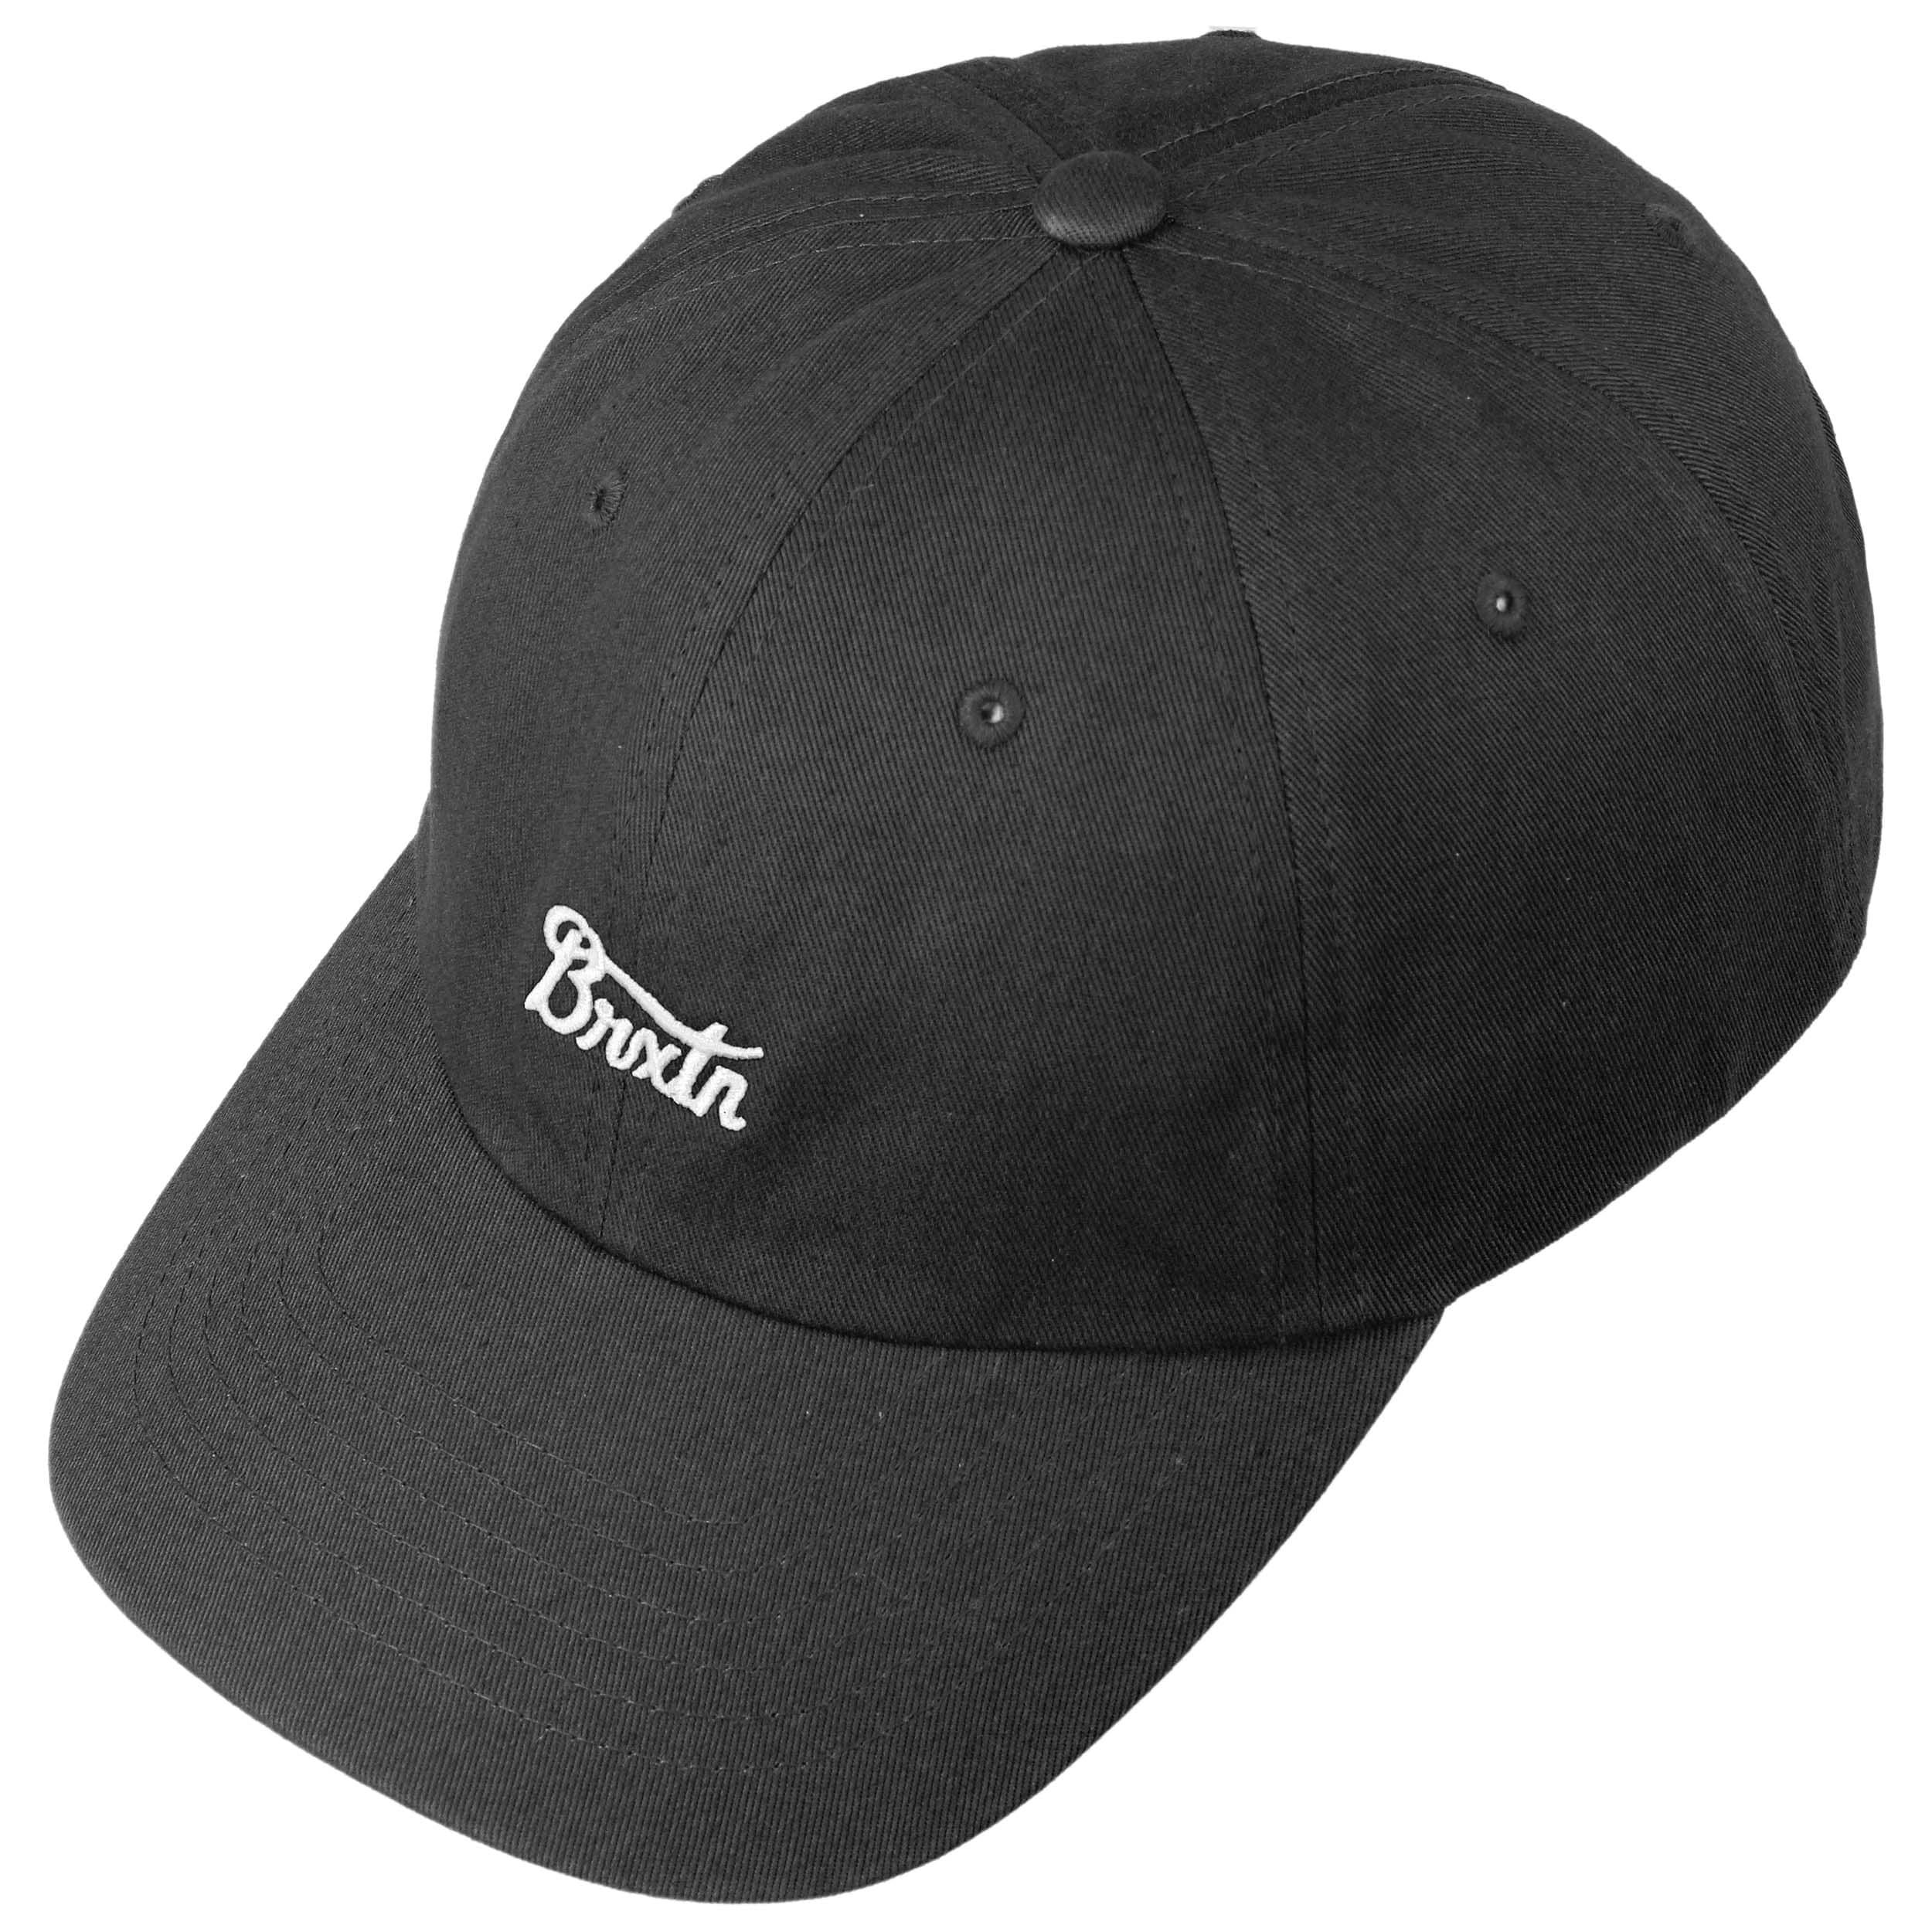 Portero strapback cap by brixton 34 95 for Porte 4 cap janet